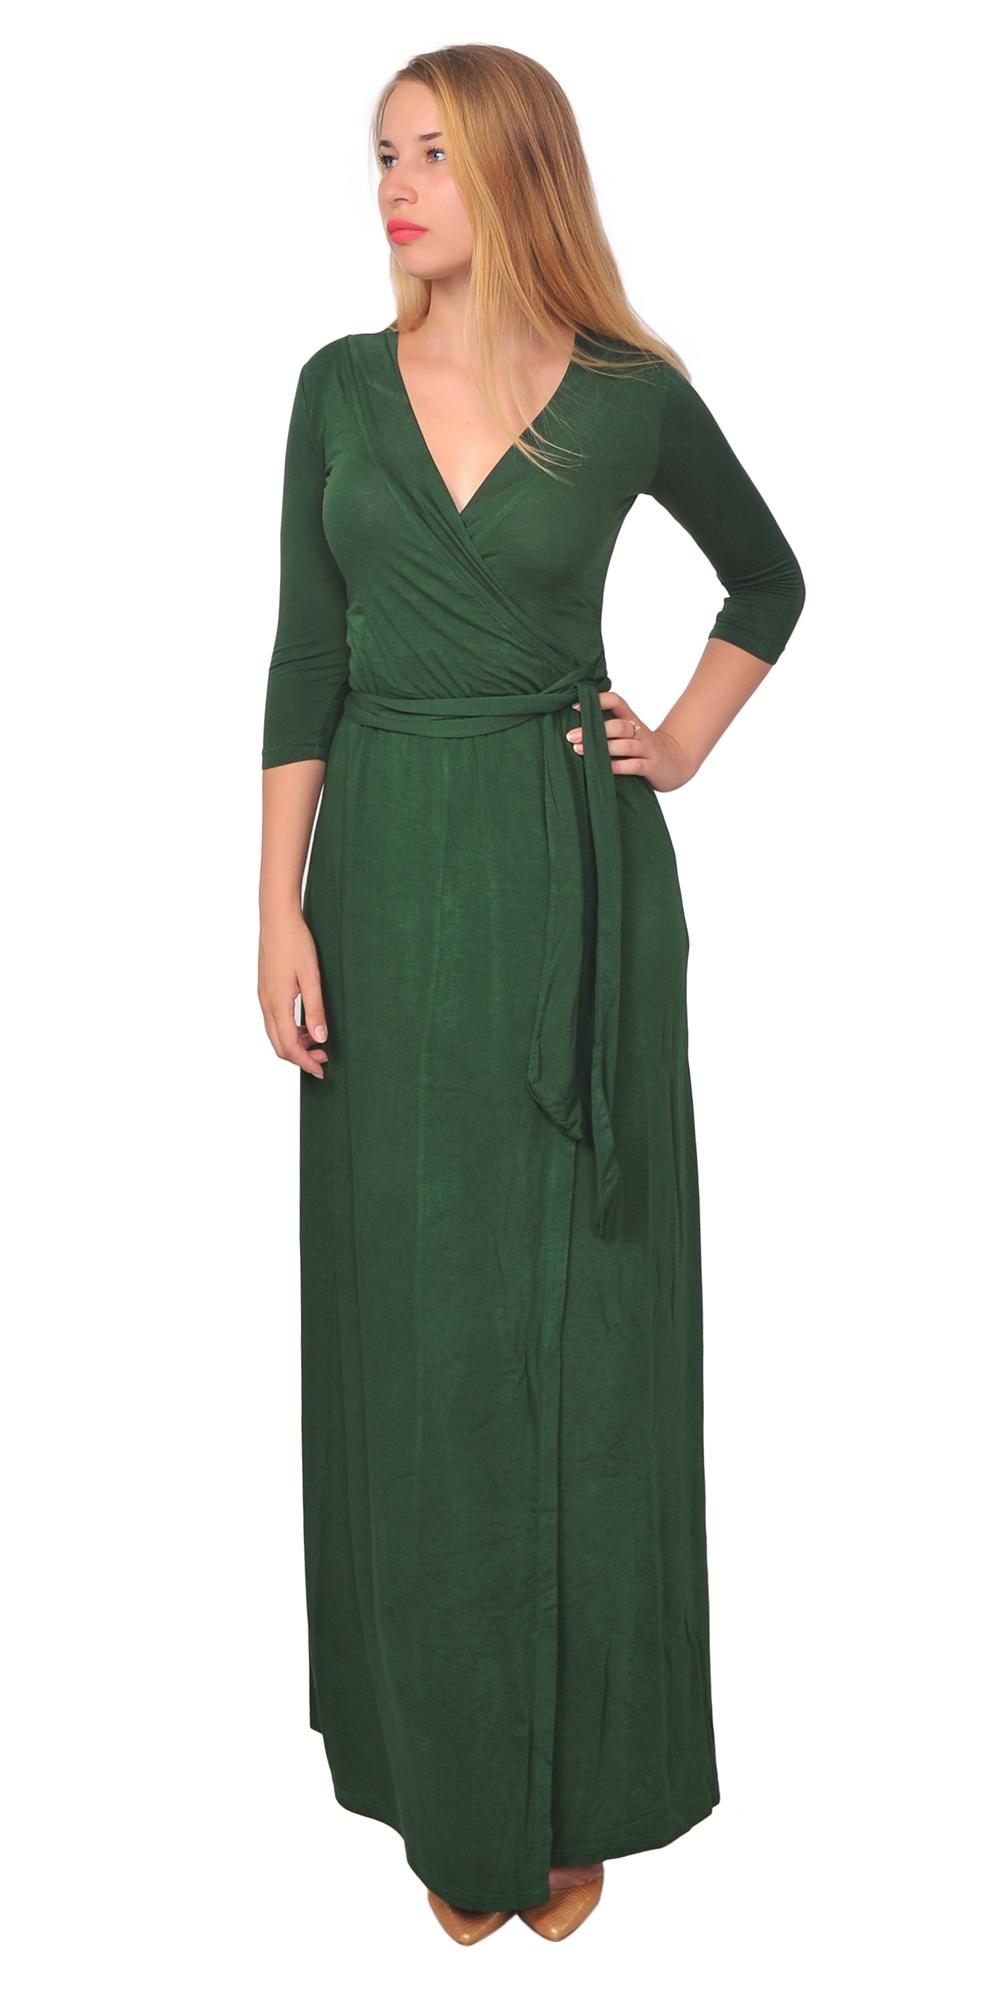 LONG SLEEVE MAXI WRAP DRESS FULL LENGTH WAIST TIE CROSSOVER DRESSES SUMMER BEACH | EBay